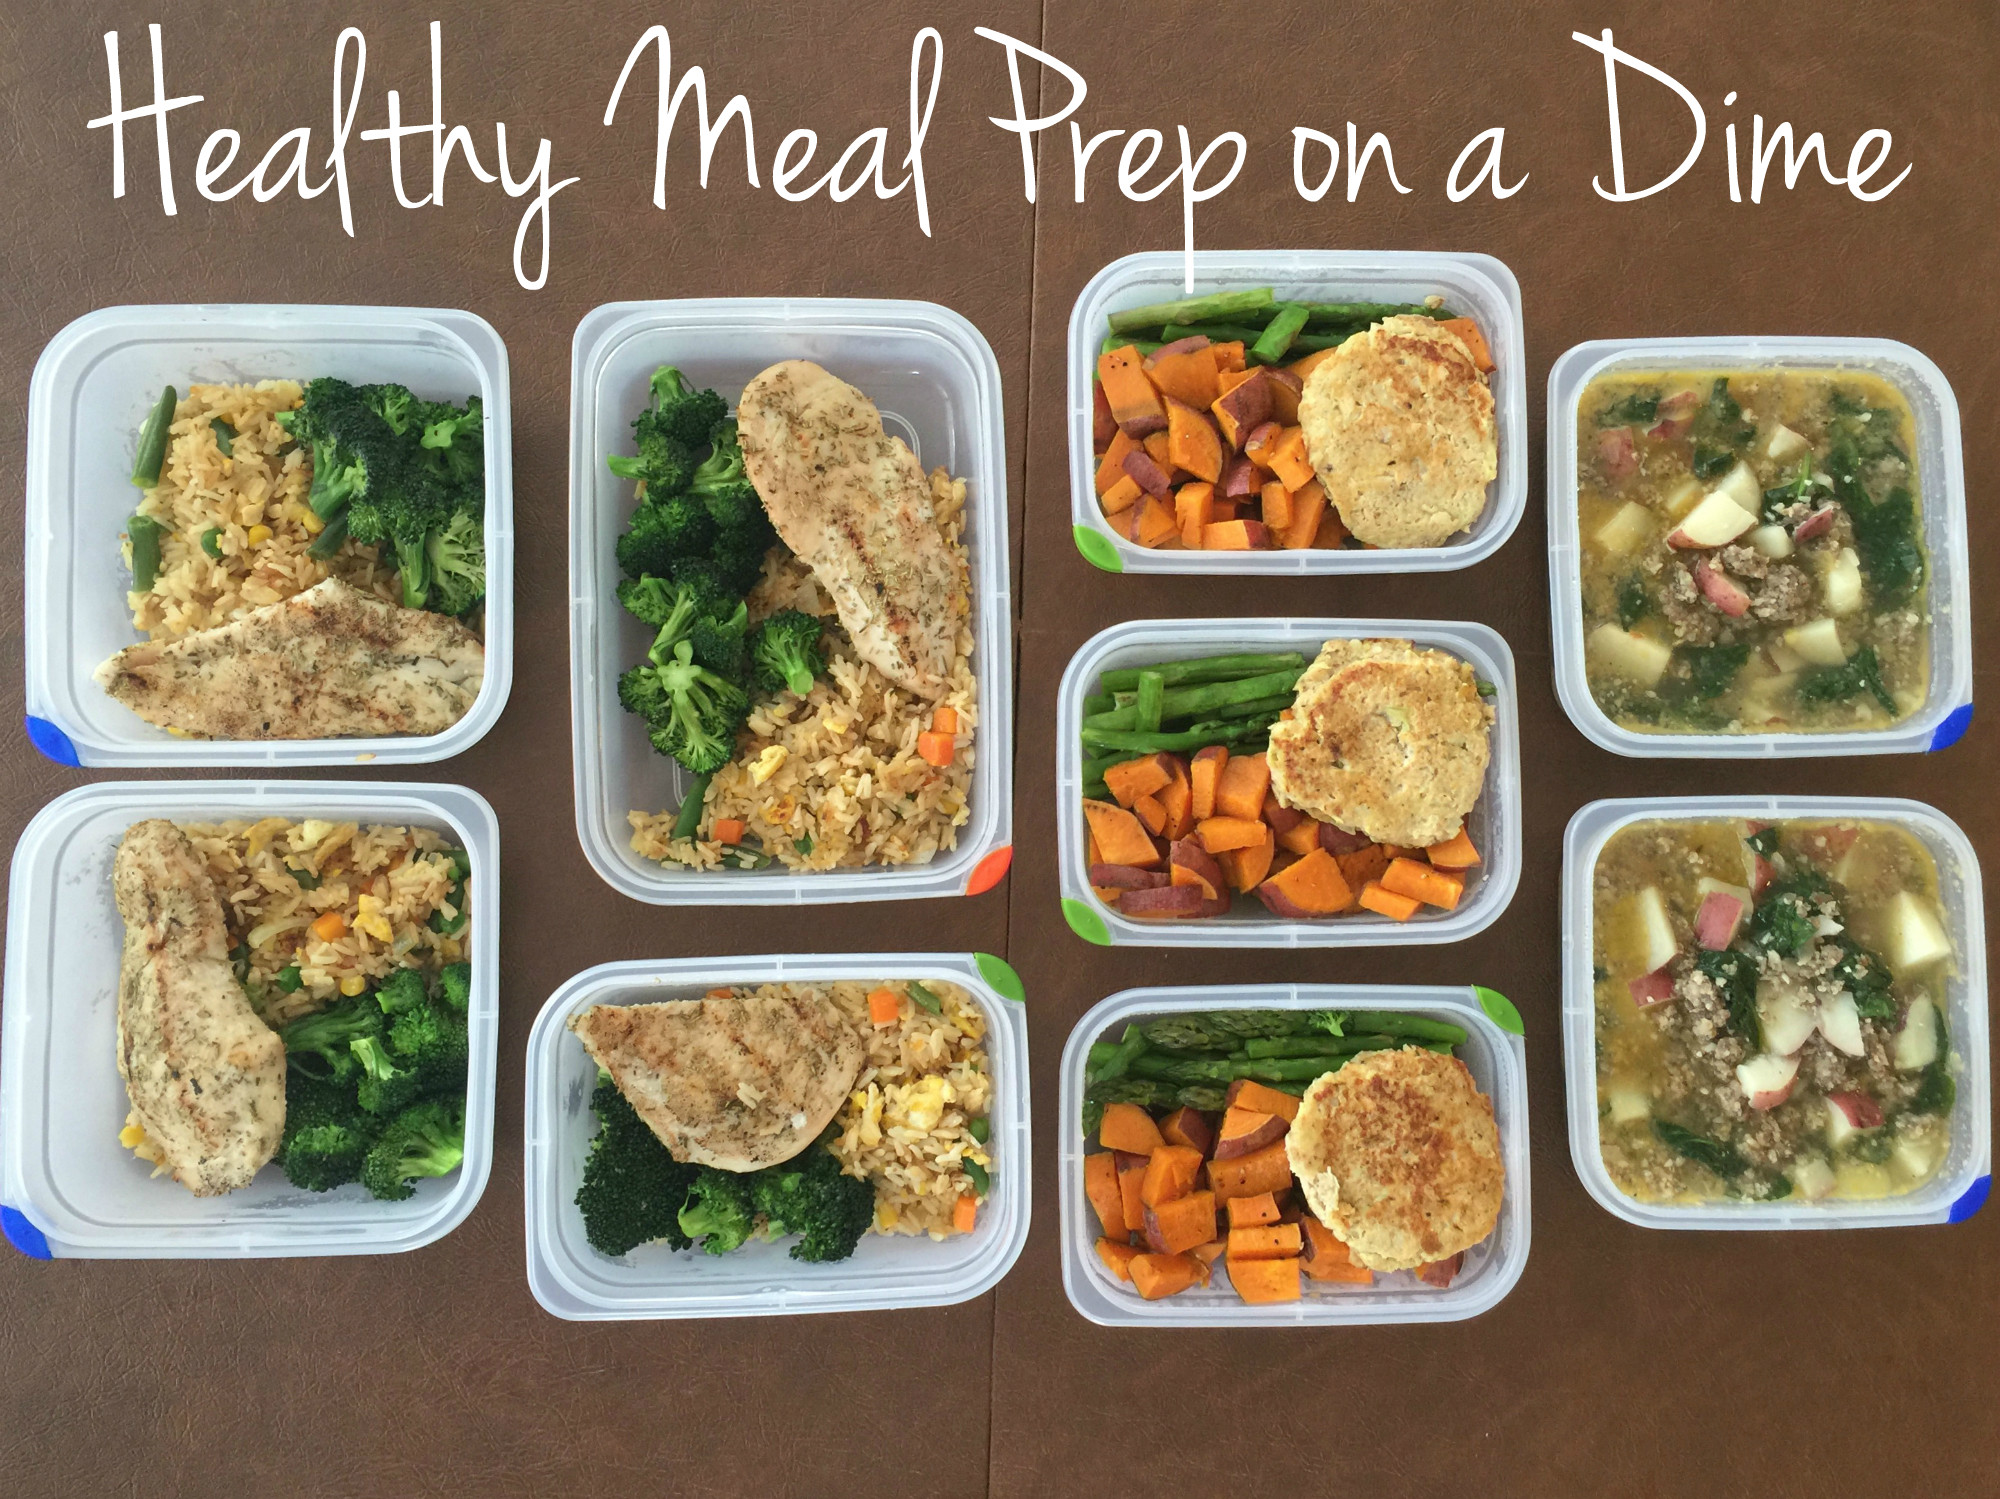 Healthy Meal Prep Dinners  Healthy Meal Prep on a Dime sssyrah